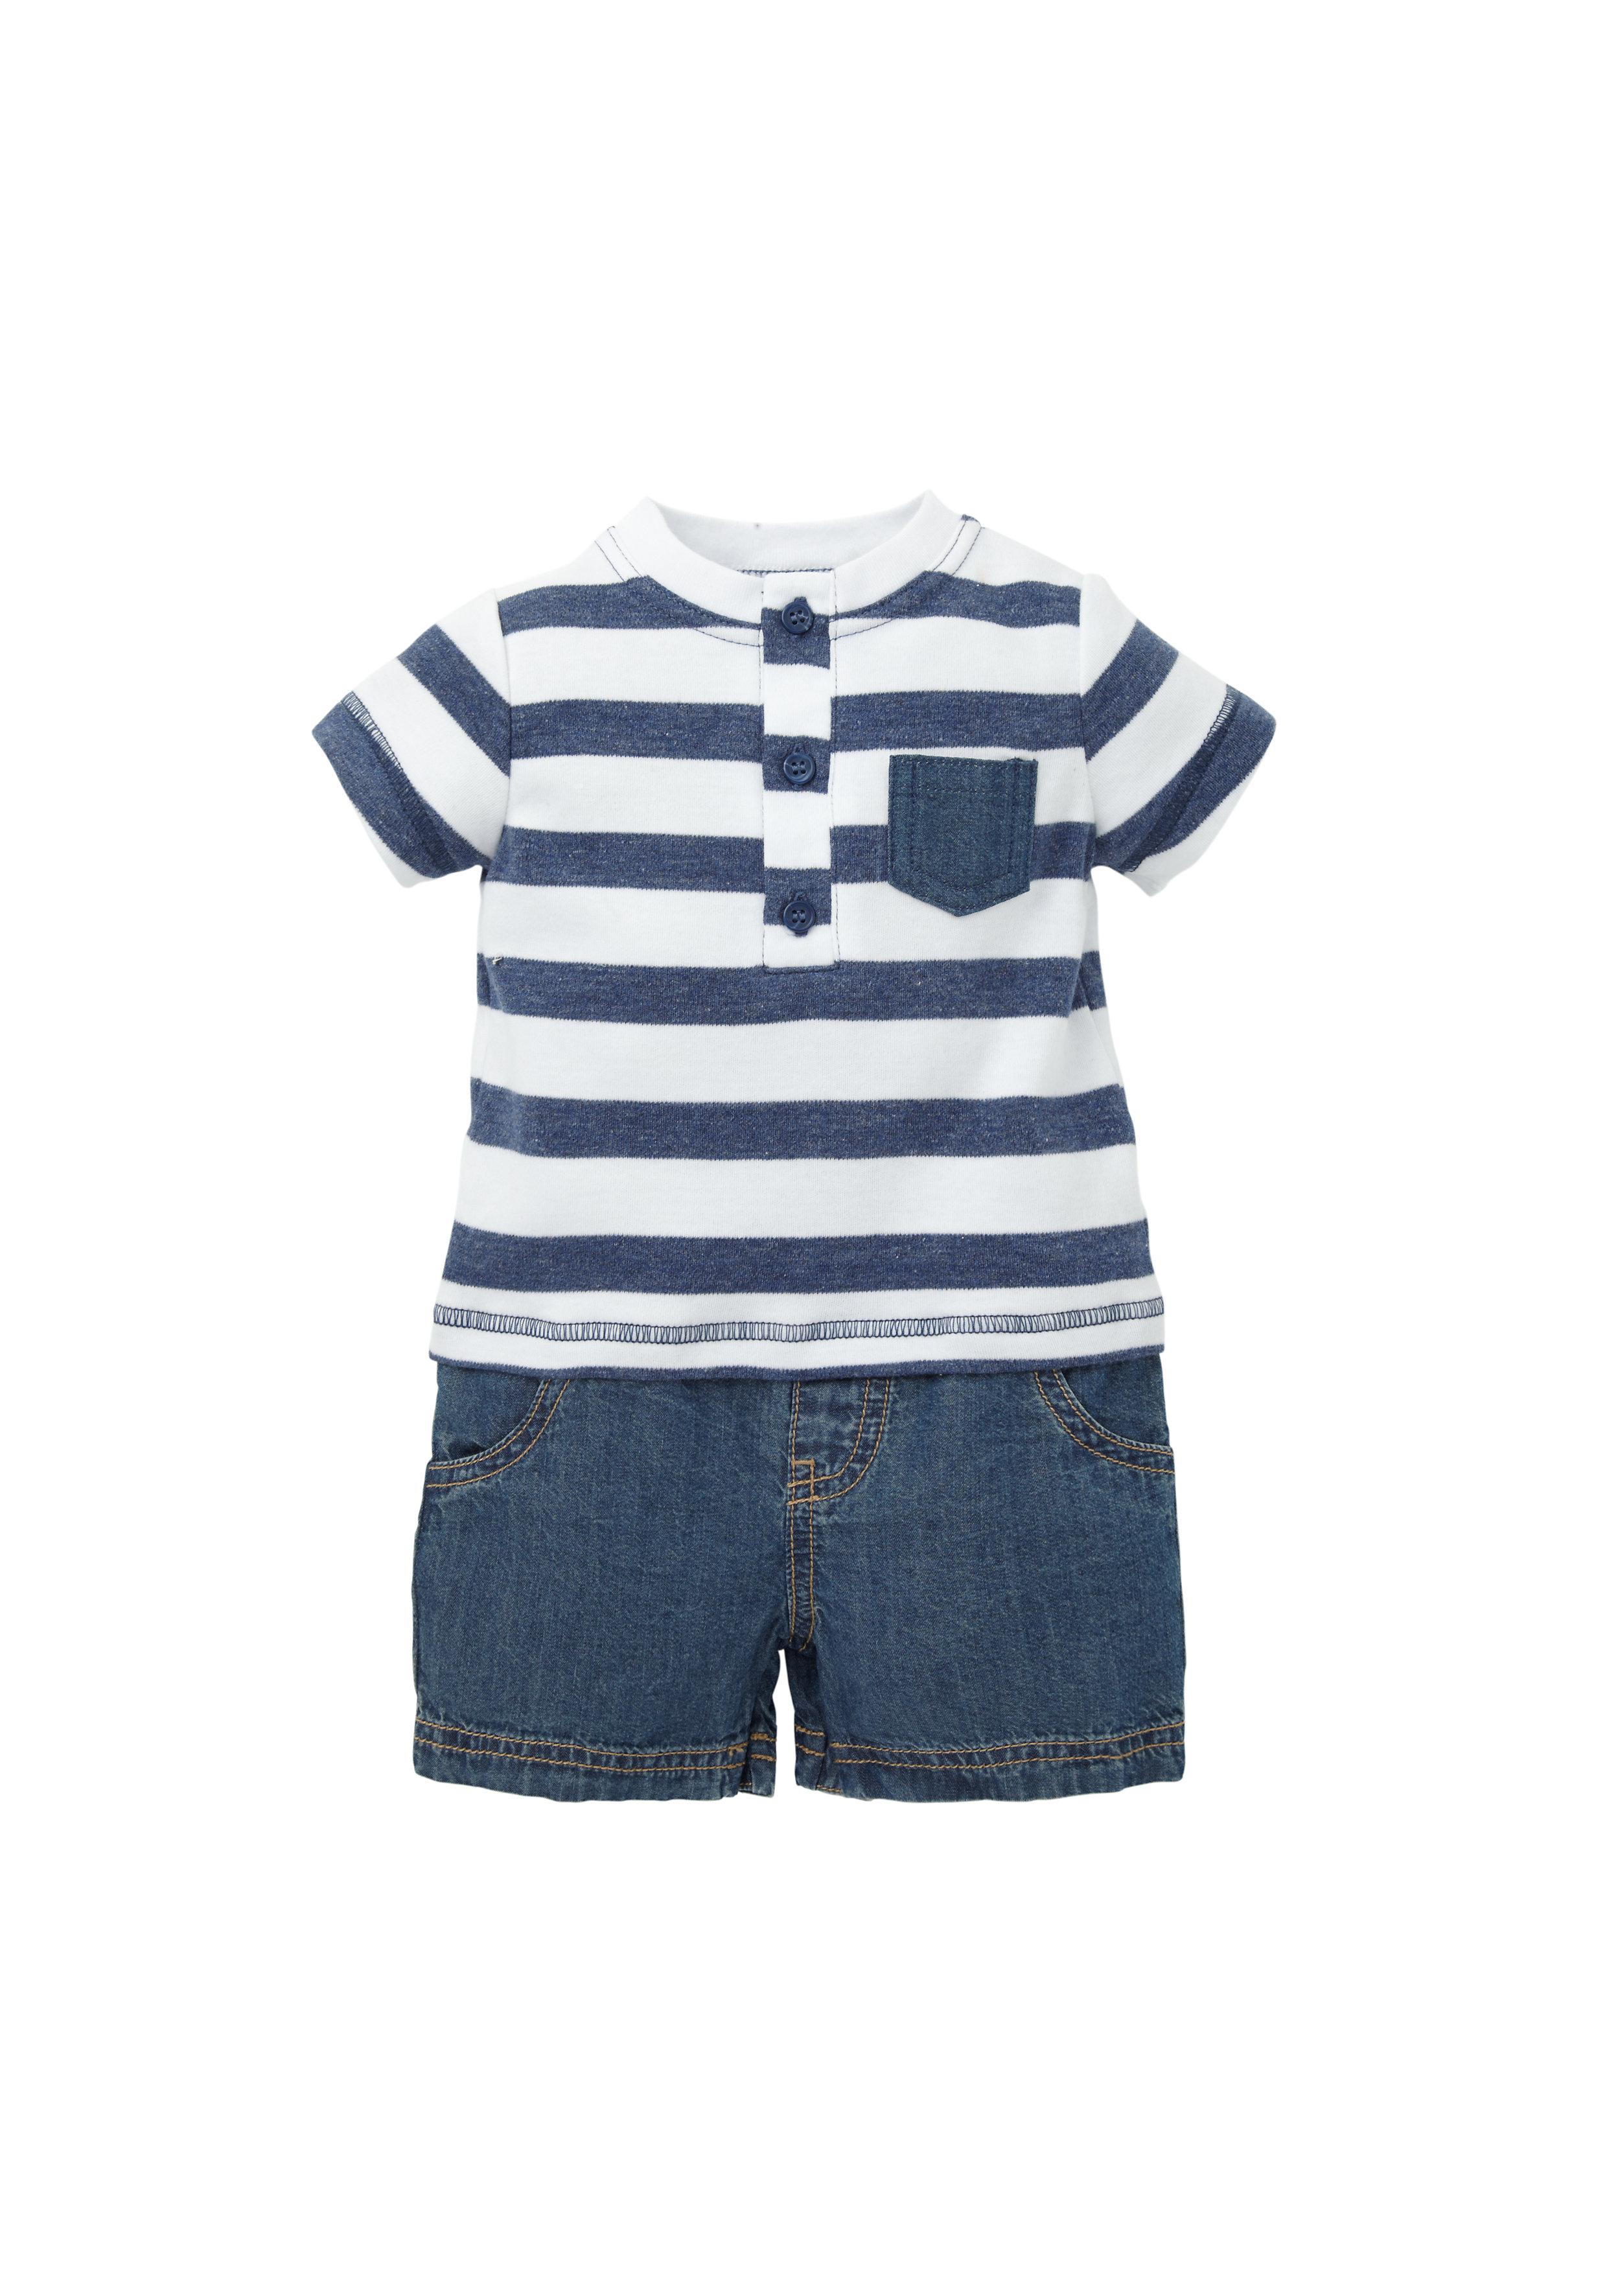 Mothercare | Boys Half Sleeves Mock T-Shirt Romper Striped - Navy